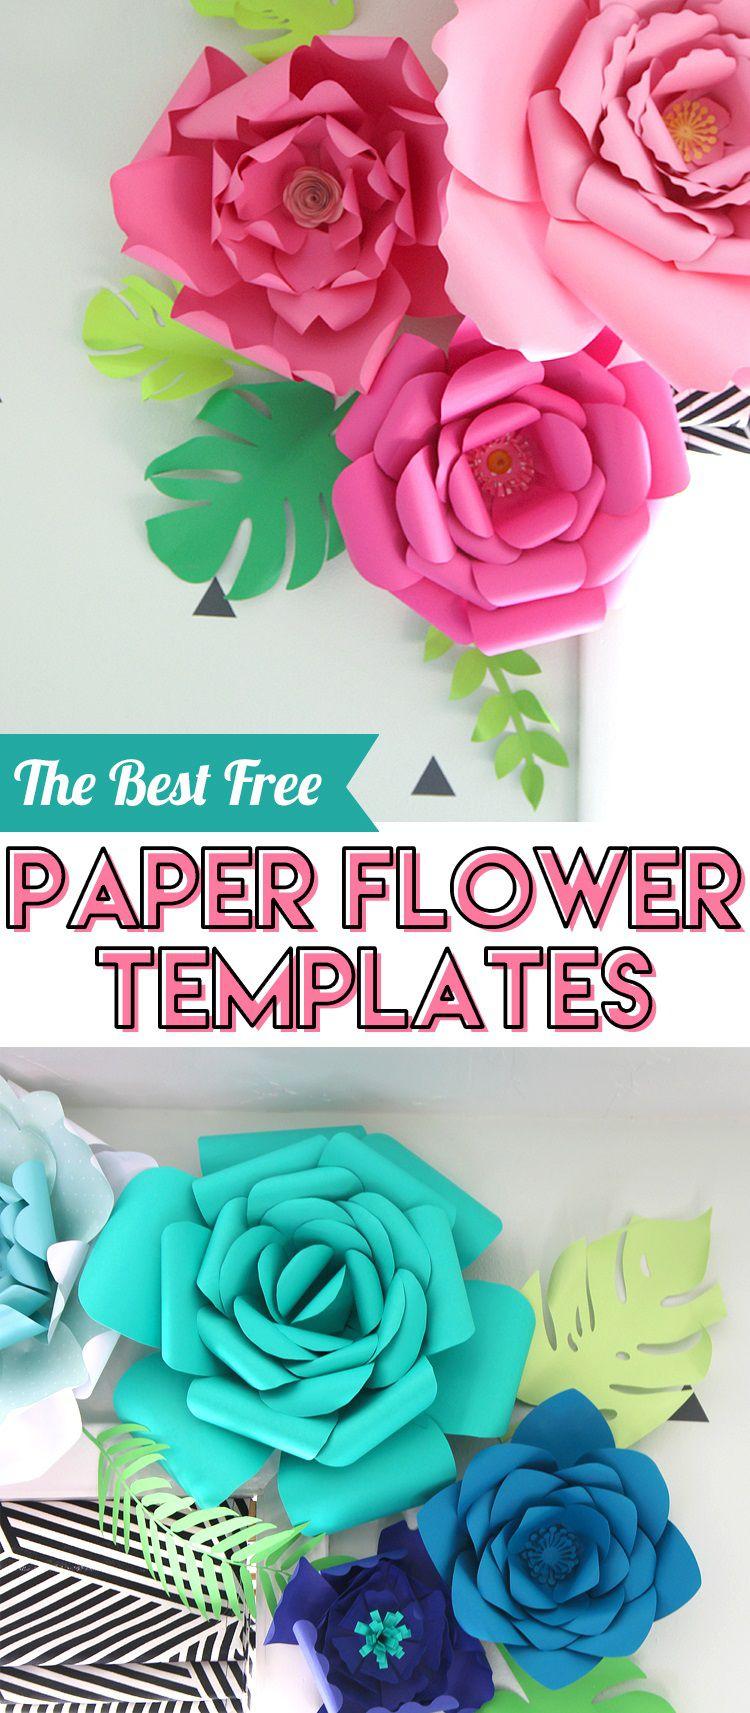 008 Marvelou Giant Rose Paper Flower Template Free Inspiration Full